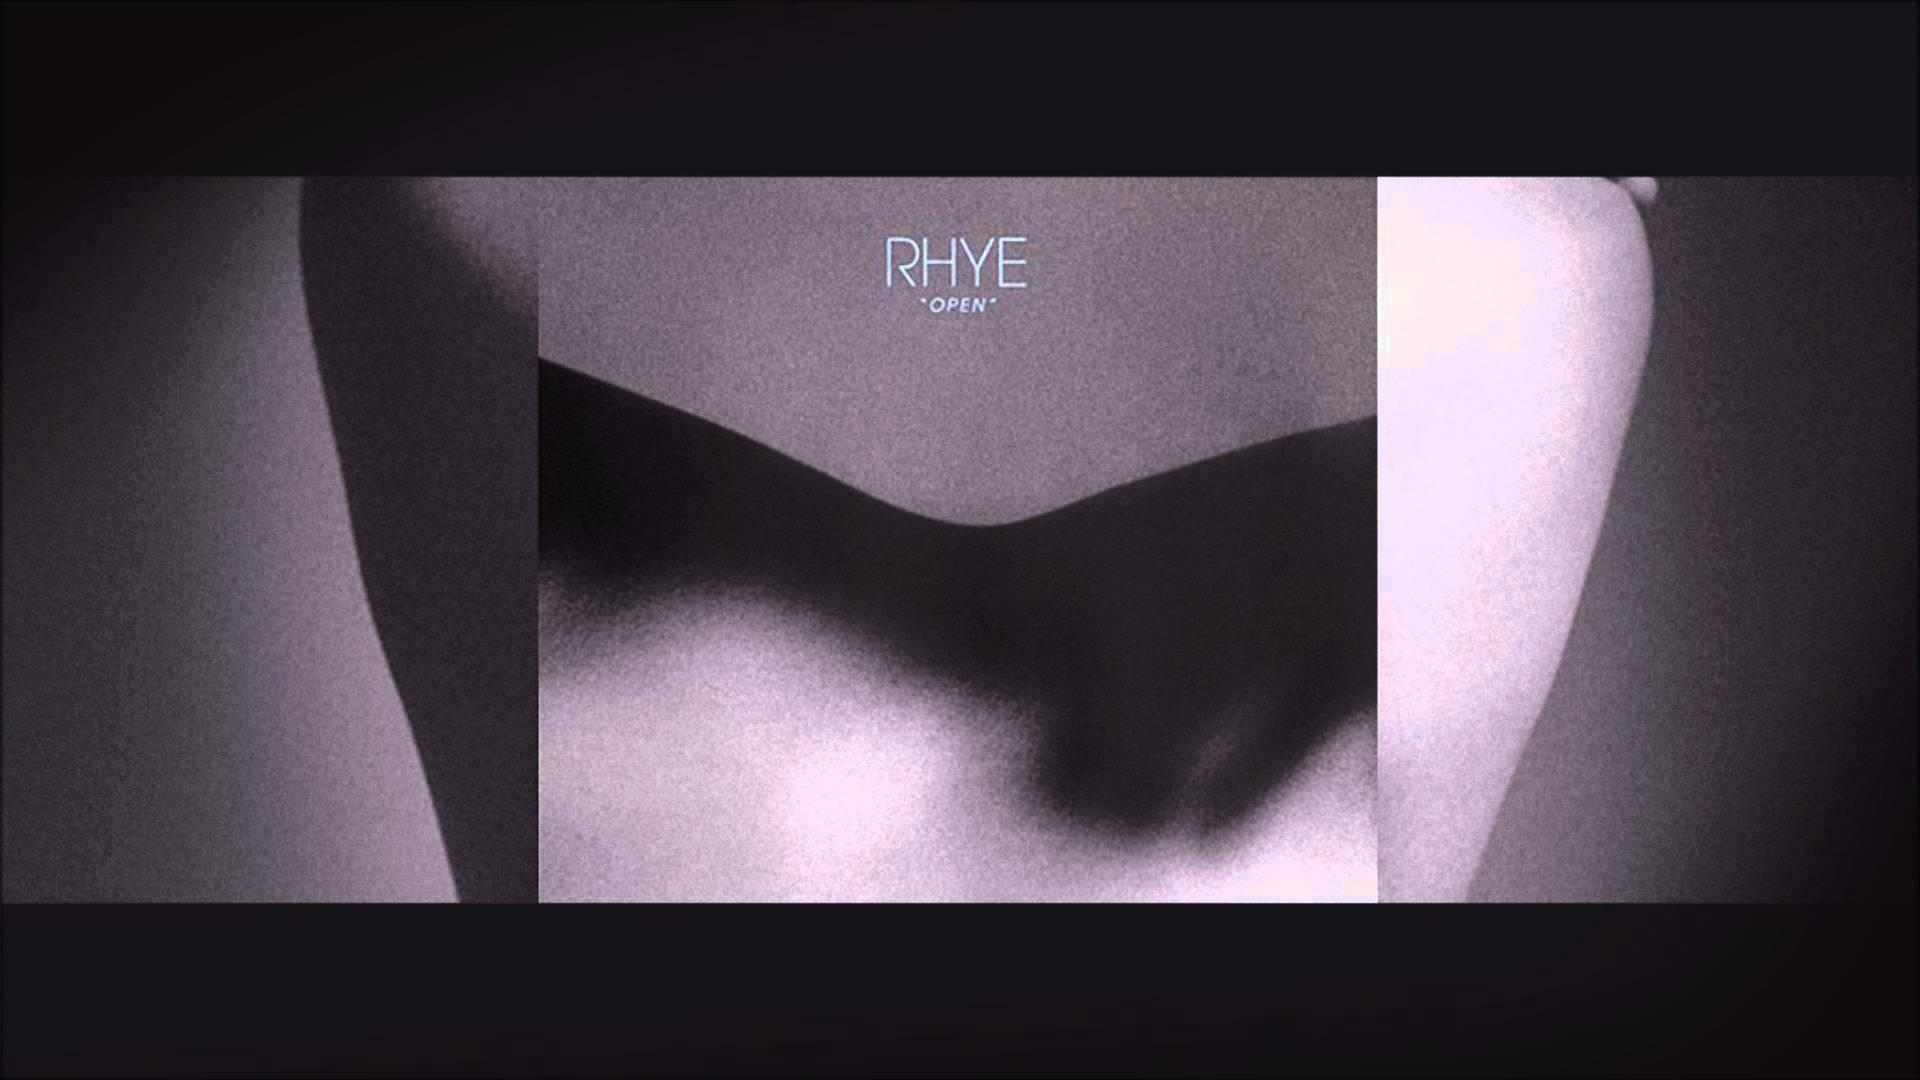 Rhye - Open (Set white Edit version)